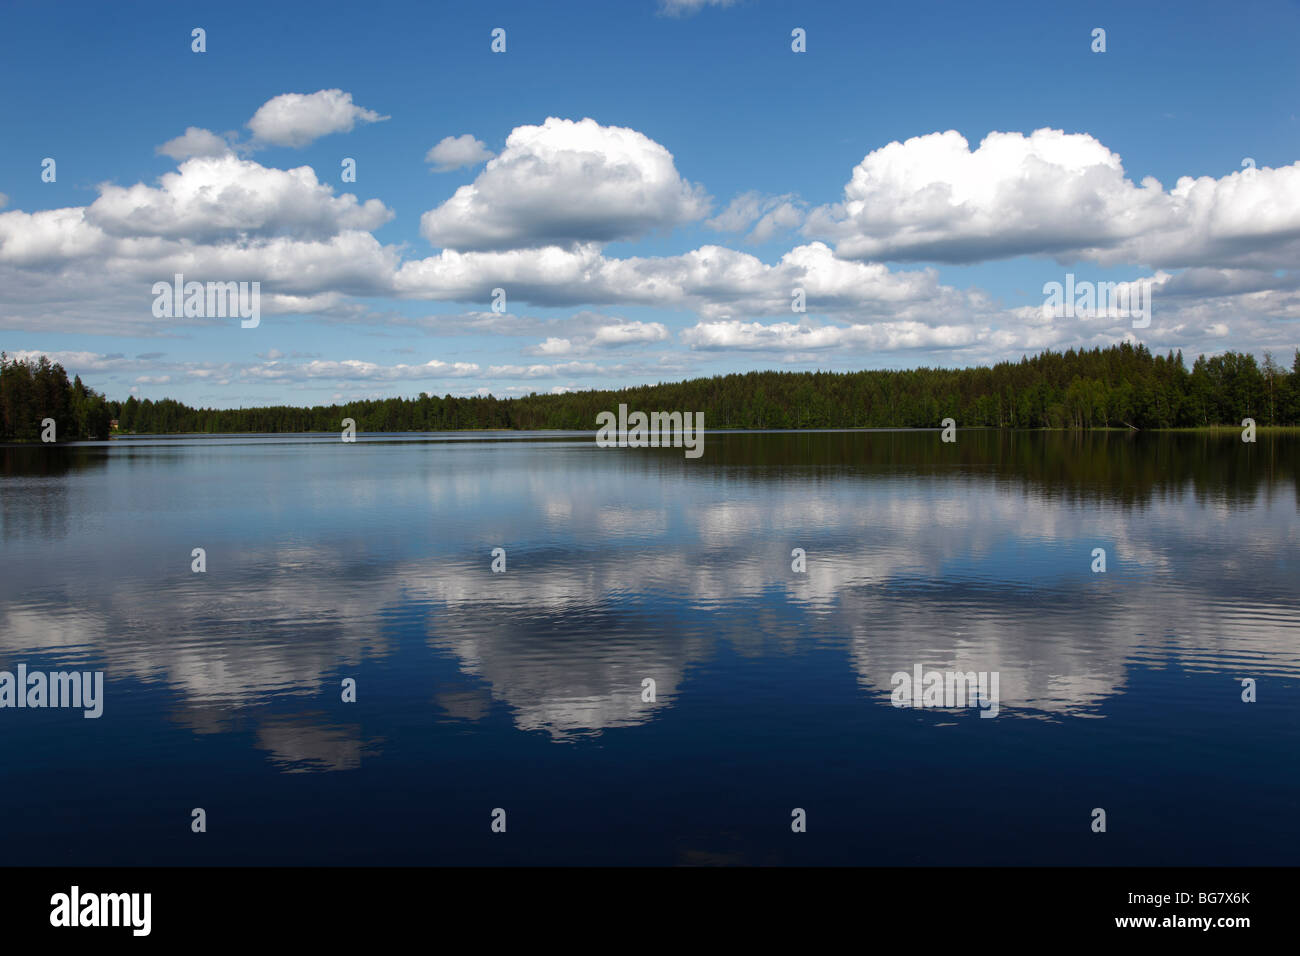 Finland, Region of Southern Savonia, Savonlinna, Saimaa Lake District, Clouds Reflected in Lake Puruvesi - Stock Image